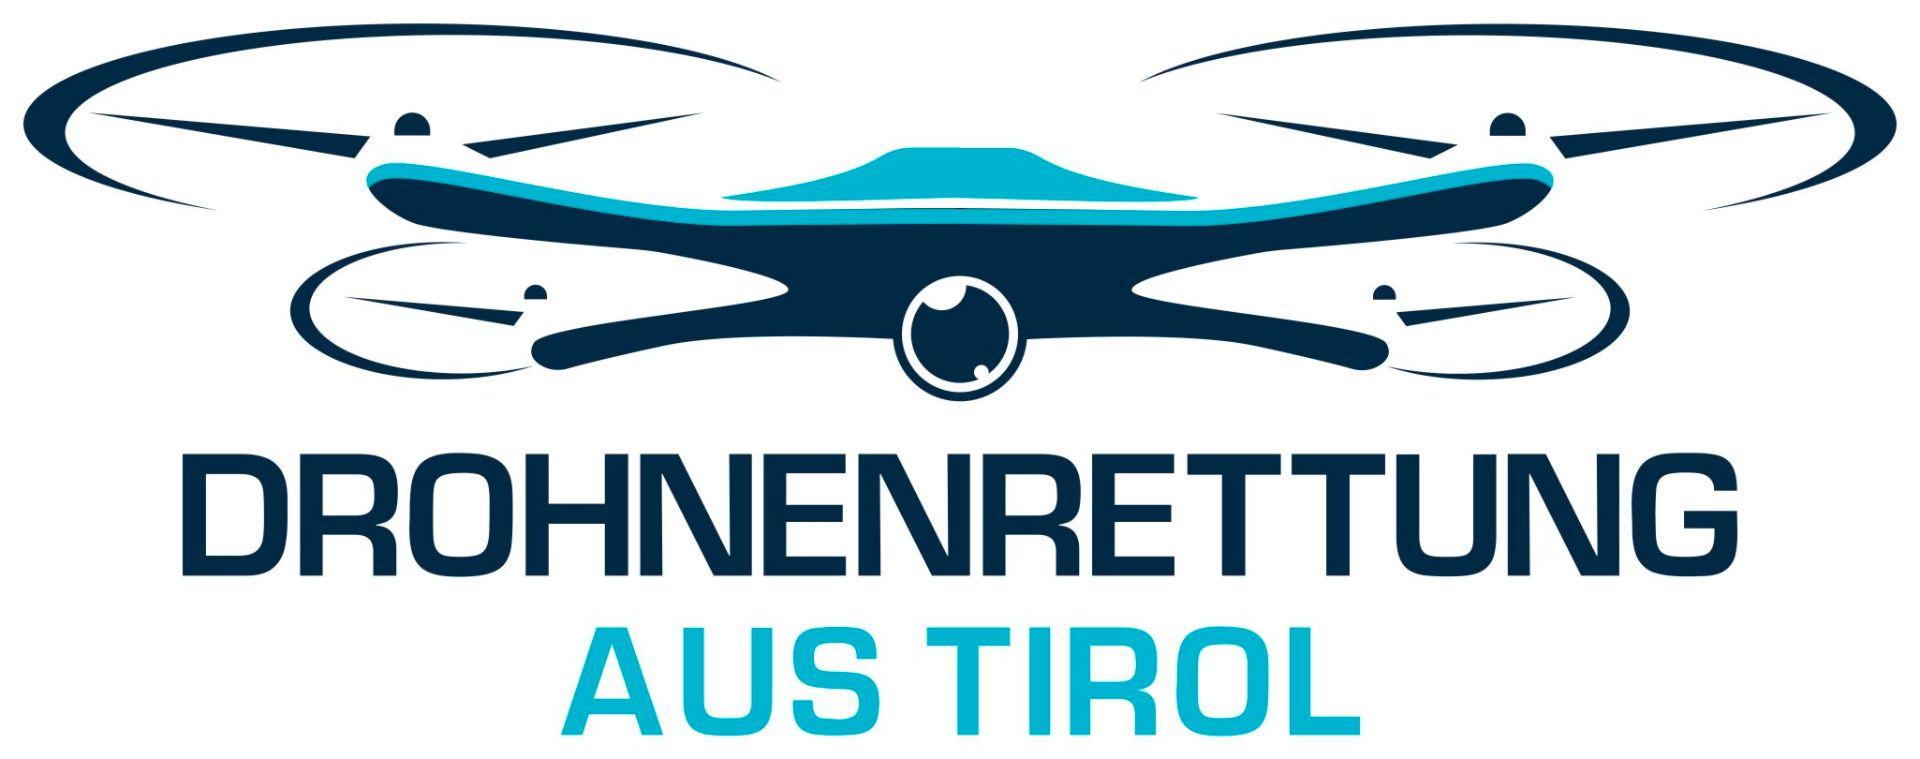 Manuela Prantl  Drohnenrettung